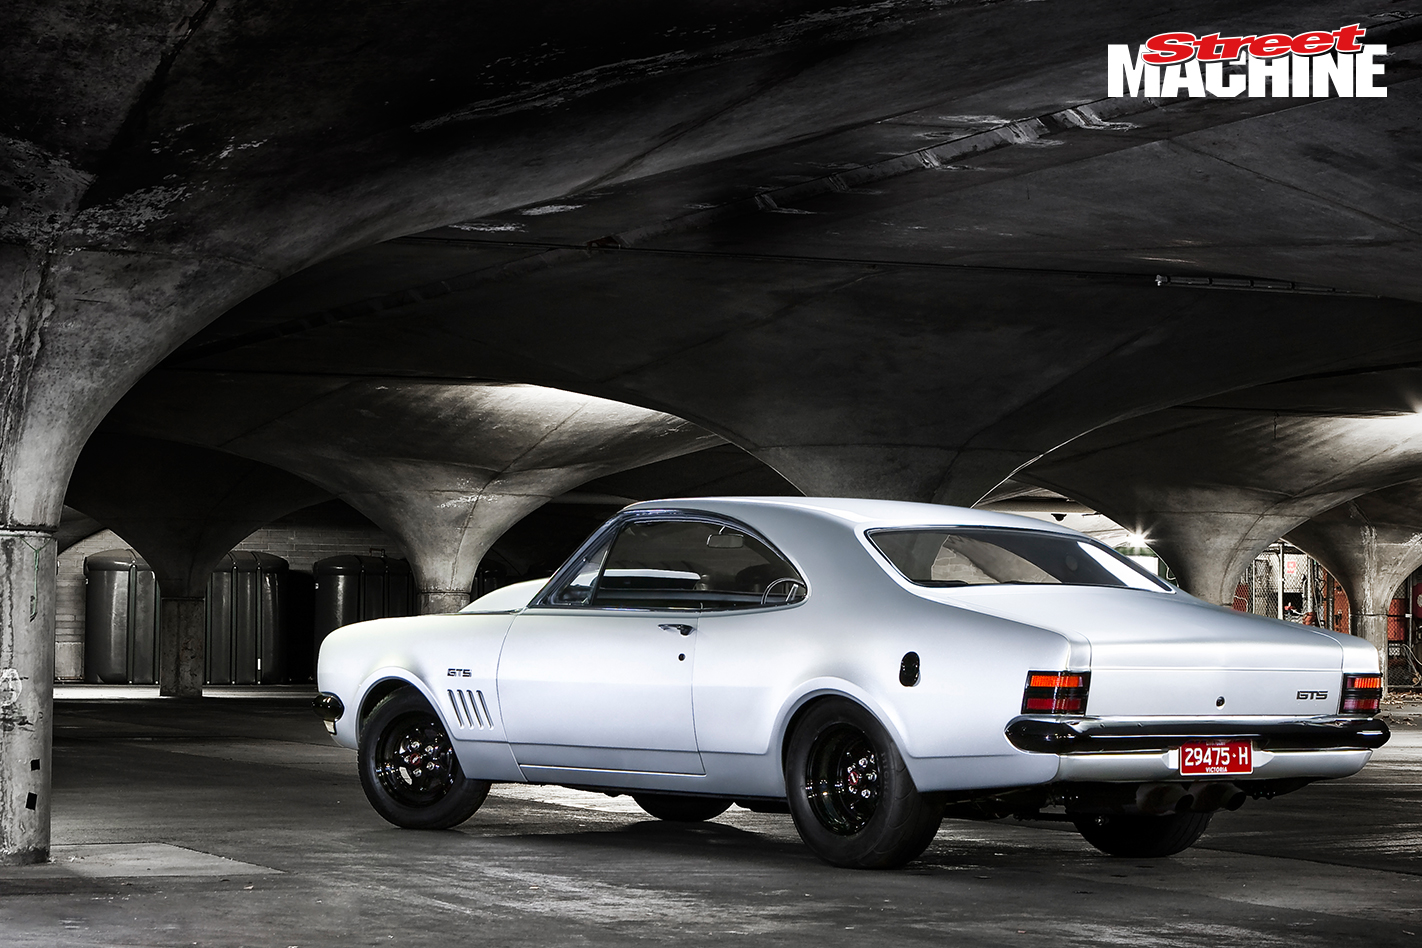 Holden HG Monaro GTS 355 V8 10